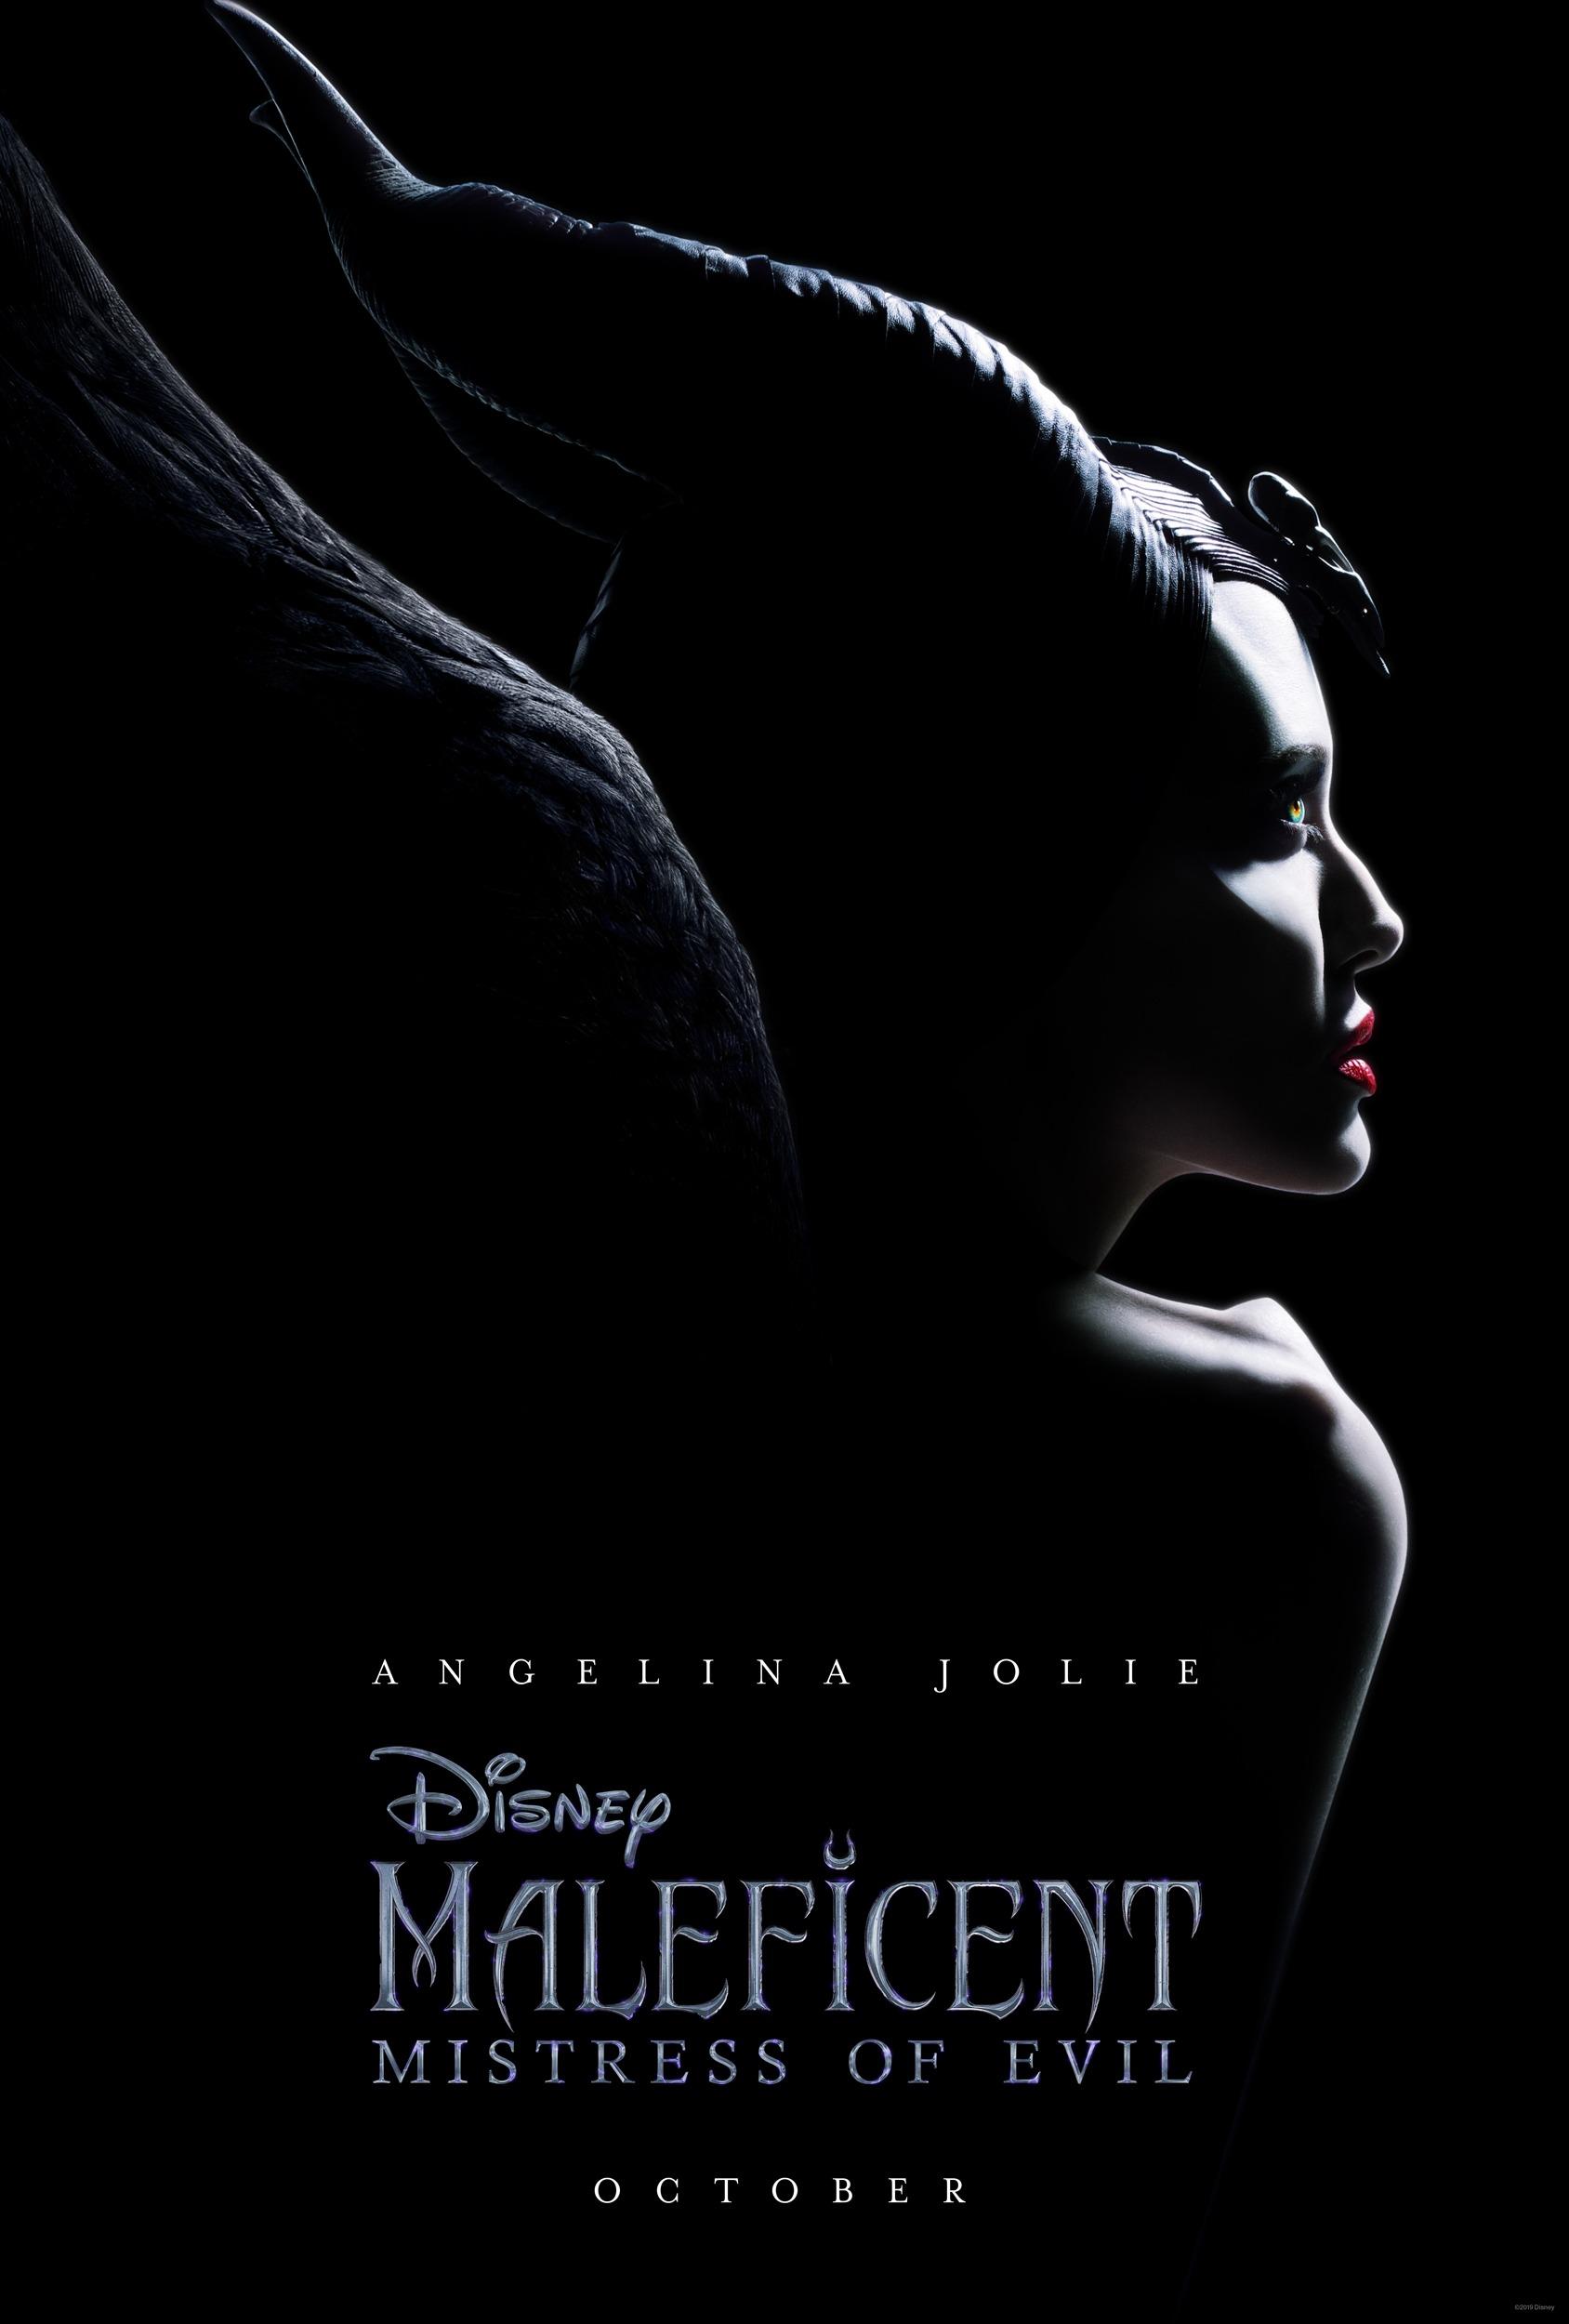 Maleficent: Mistress of Evil Teaser Poster